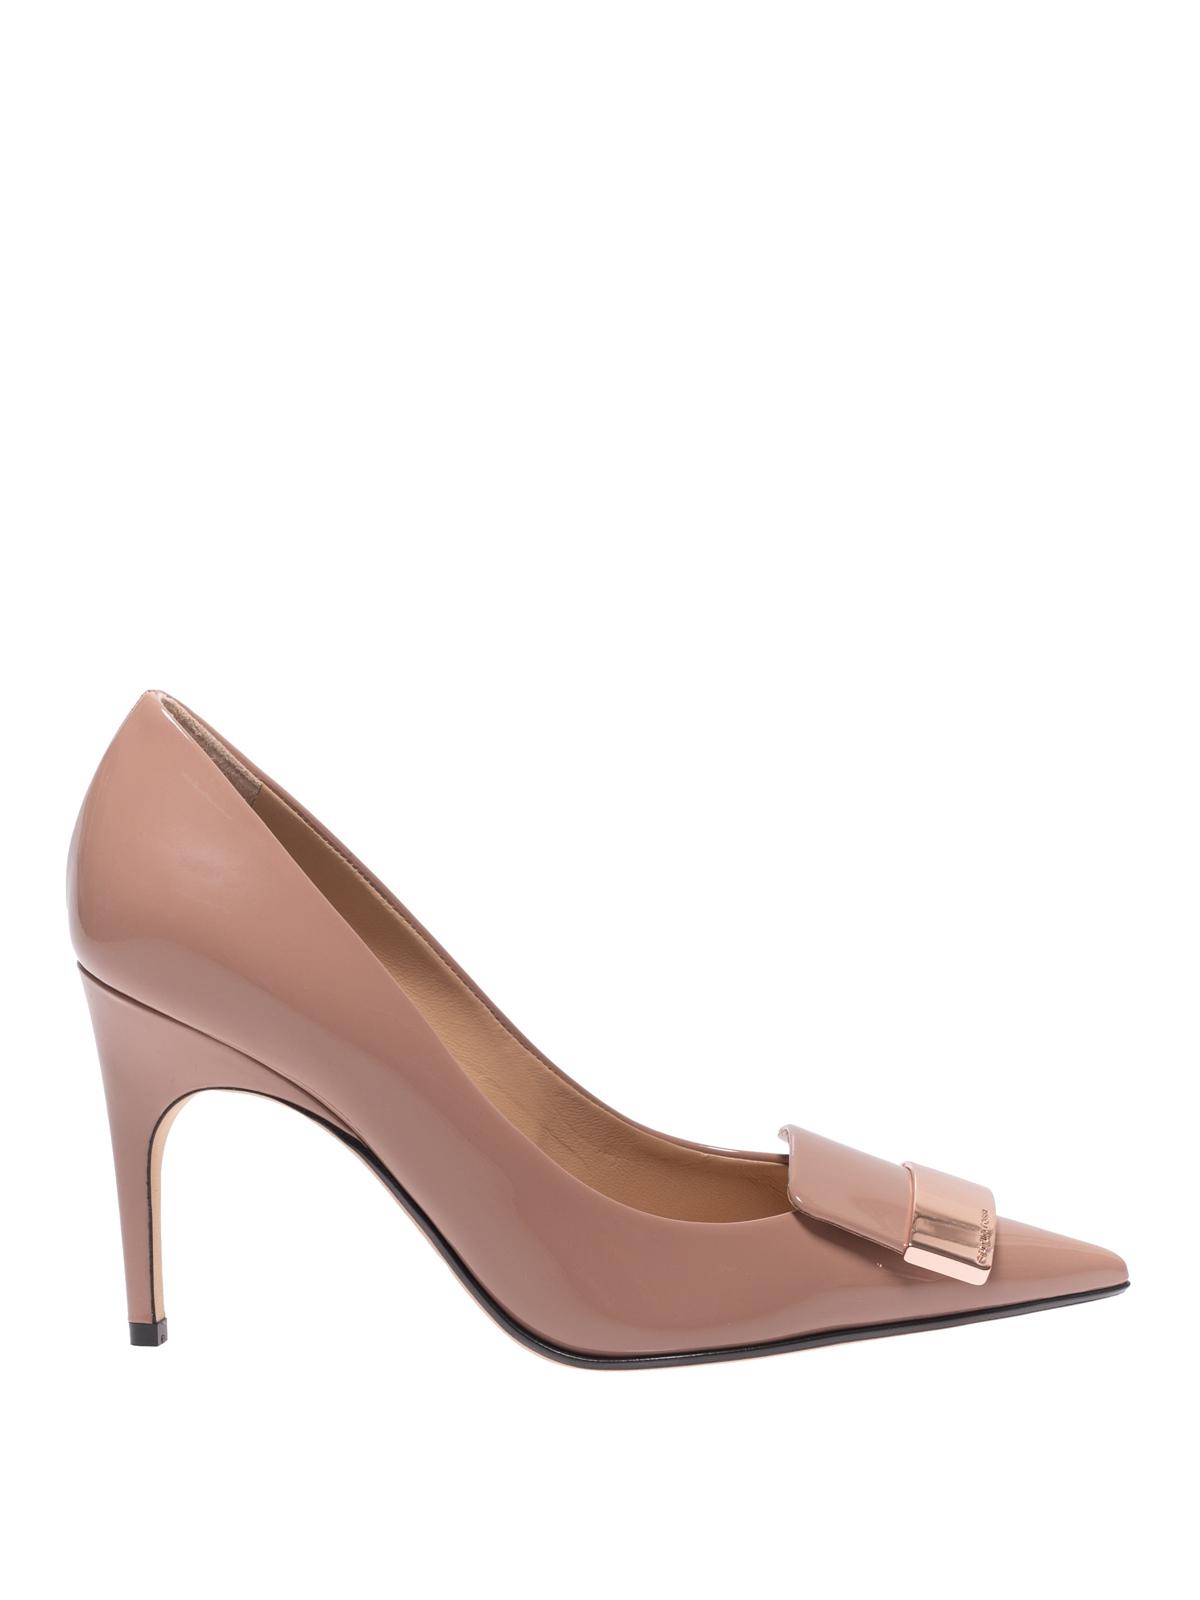 Sr1 Pink Sergio Pumps Rossi Court A78953mviv015755 Leather Shoes sCBQdxrth